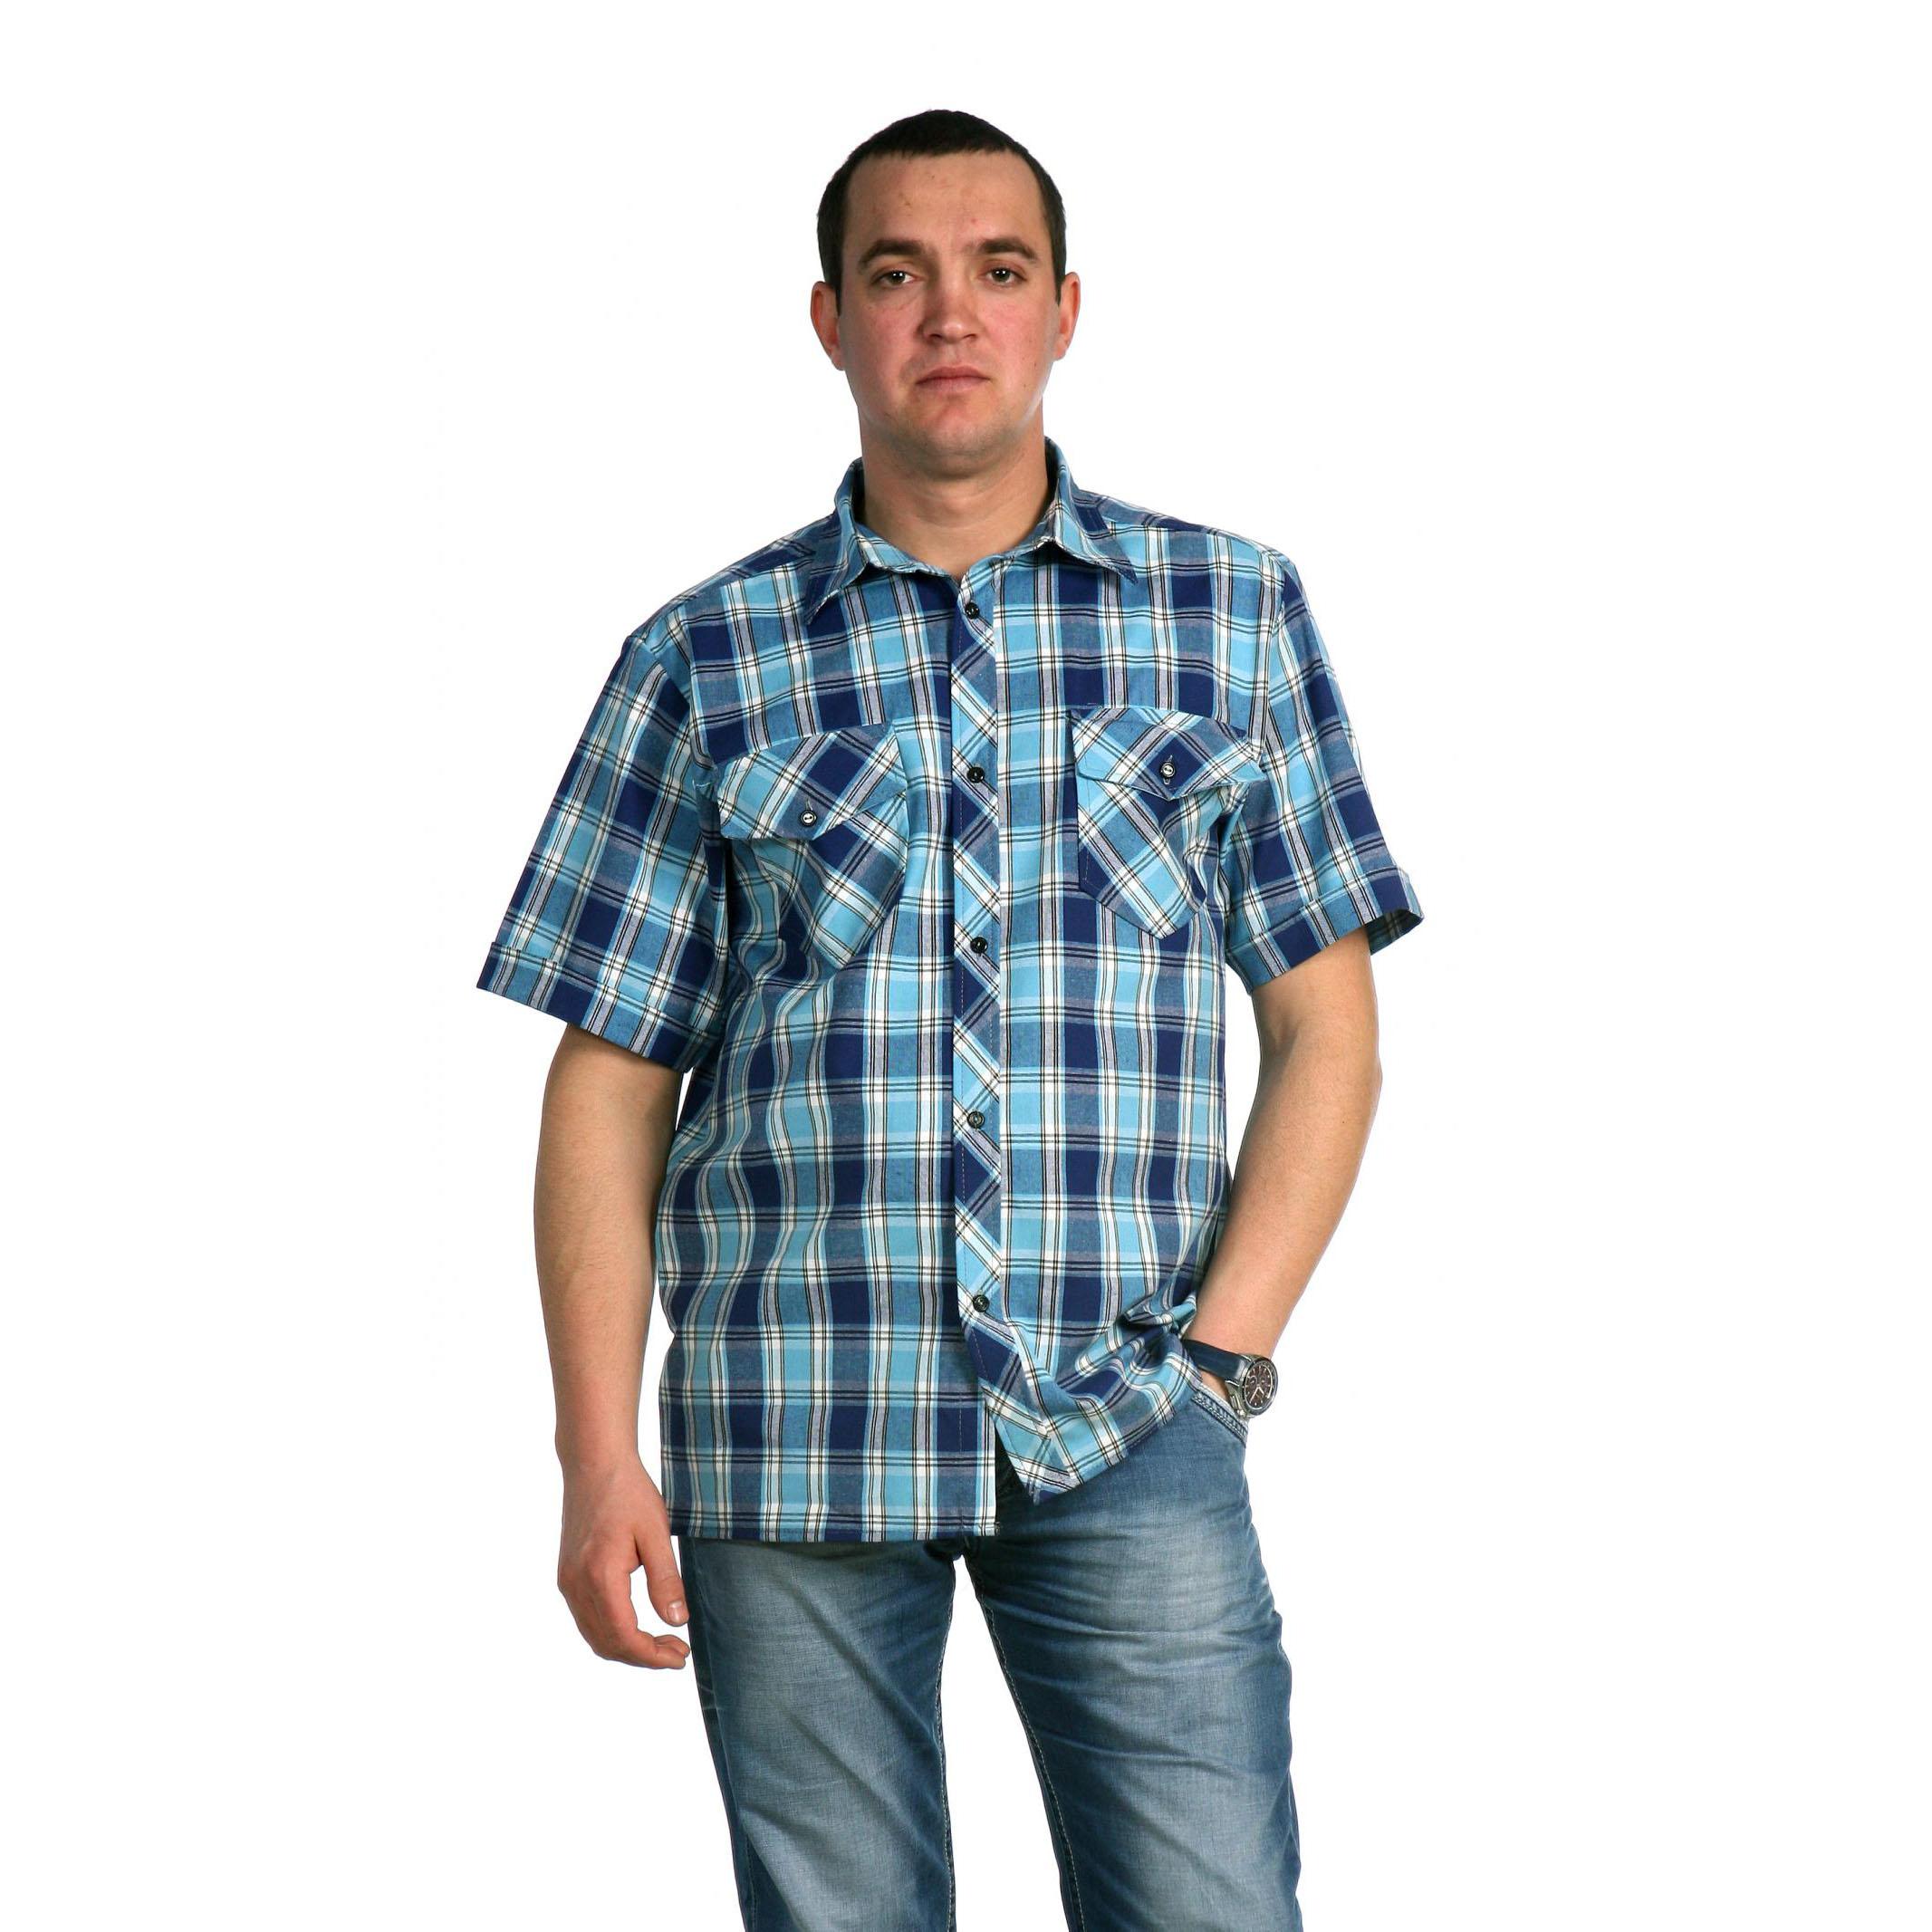 Мужская рубашка «Аллан» арт. 0013, размер 48Рубашки<br>Обхват груди:96 см<br>Обхват талии:88 см<br>Обхват бедер:102 см<br>Обхват шеи, ворот:40 см<br>Рост:172-180 см<br><br>Тип: Муж. рубашка<br>Размер: 48<br>Материал: Шотландка